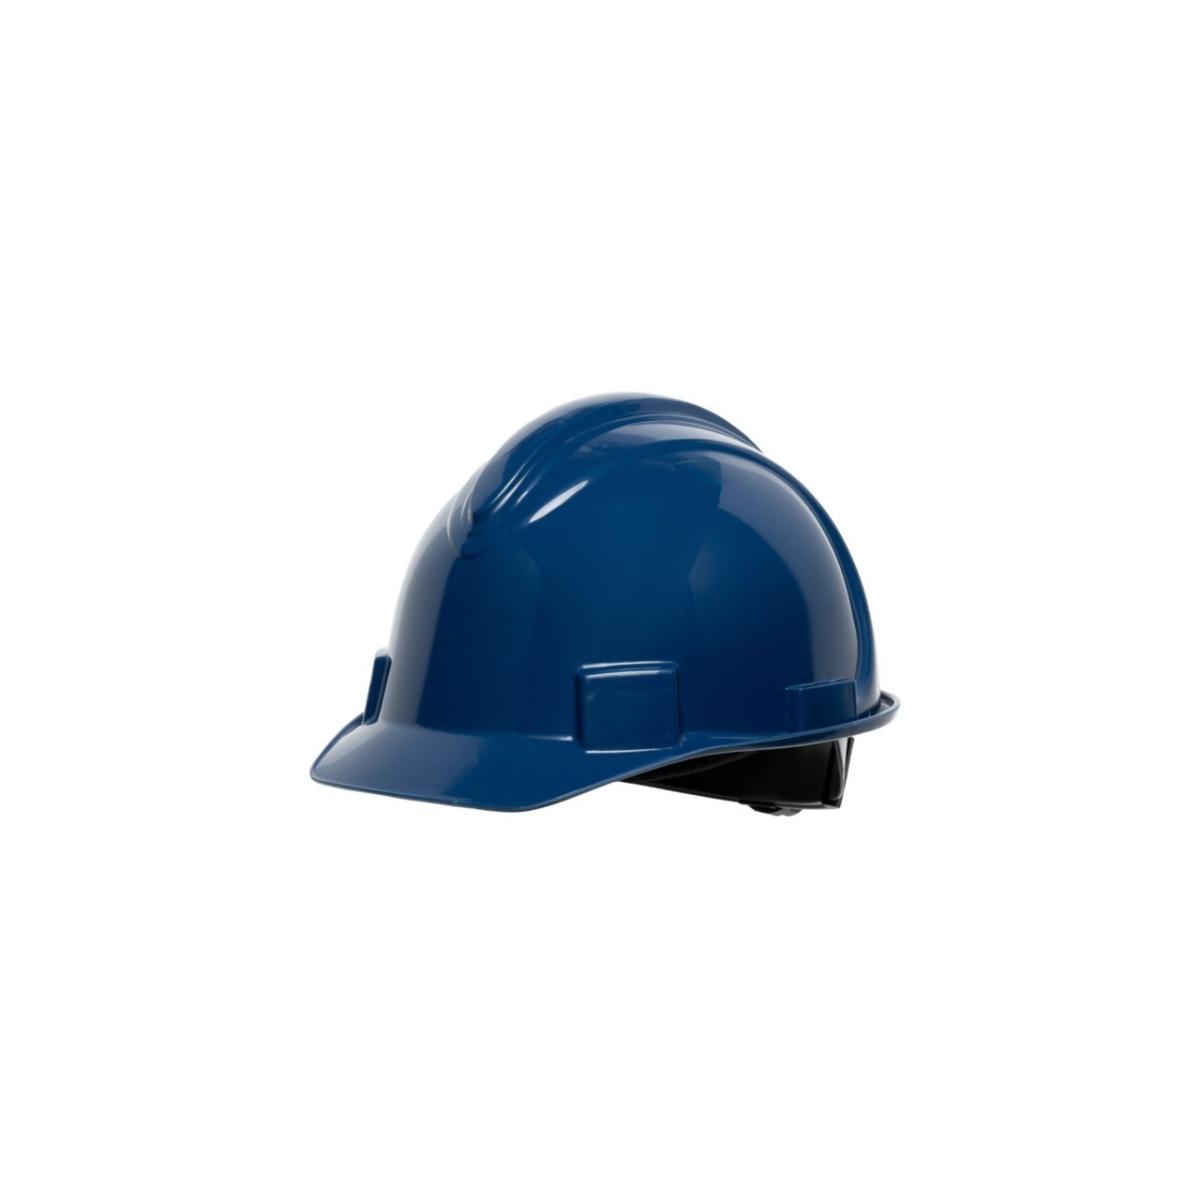 NSB11071 VENTED BLUE HARD HAT